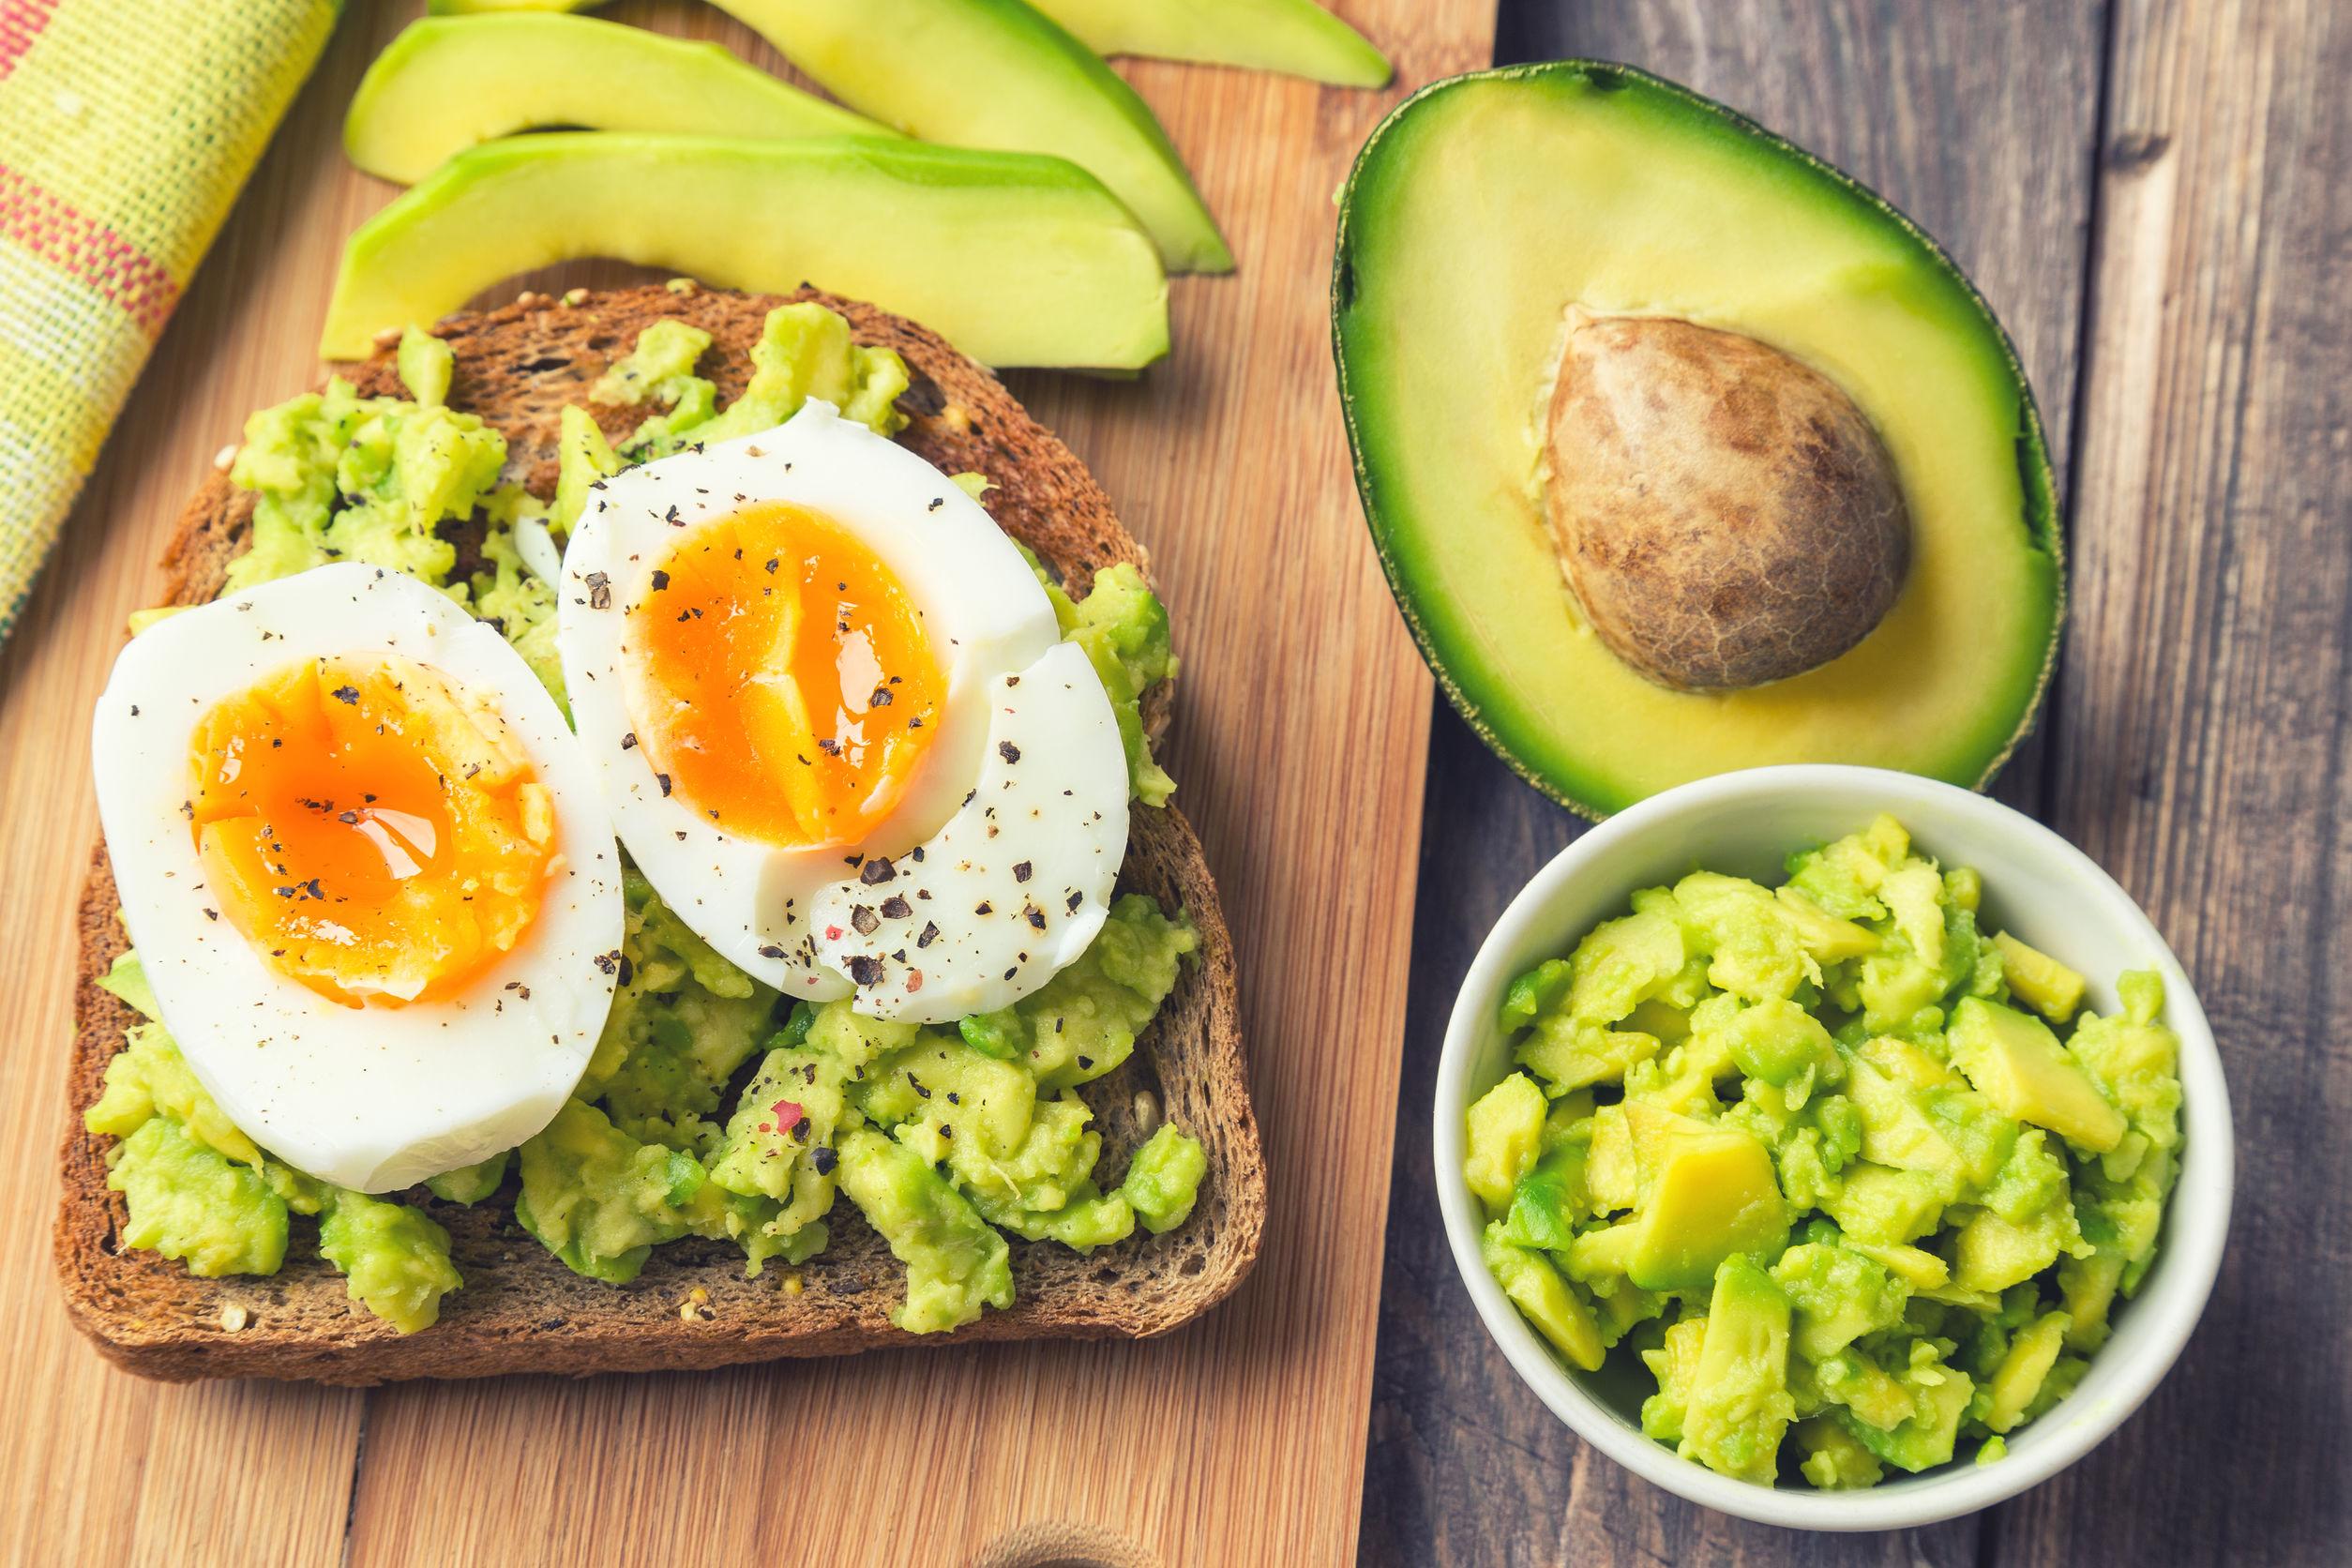 Vitamine E aliments : Top 7 des aliments anti-oxydants